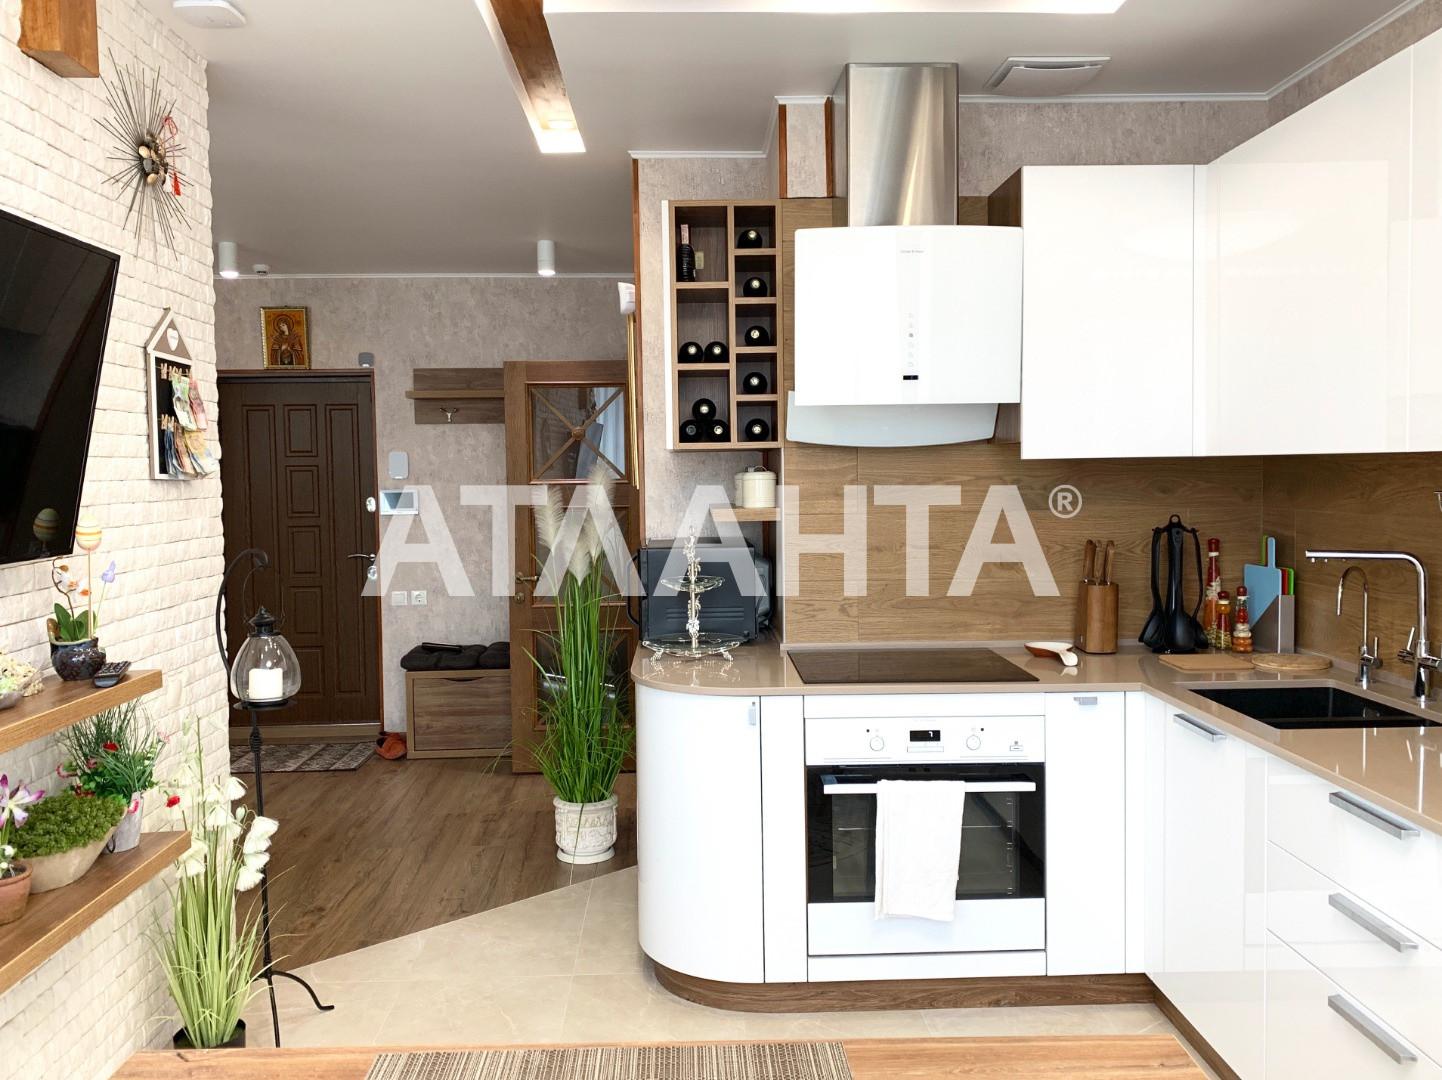 Продается 1-комнатная Квартира на ул. Балковская (Фрунзе) — 50 000 у.е. (фото №5)